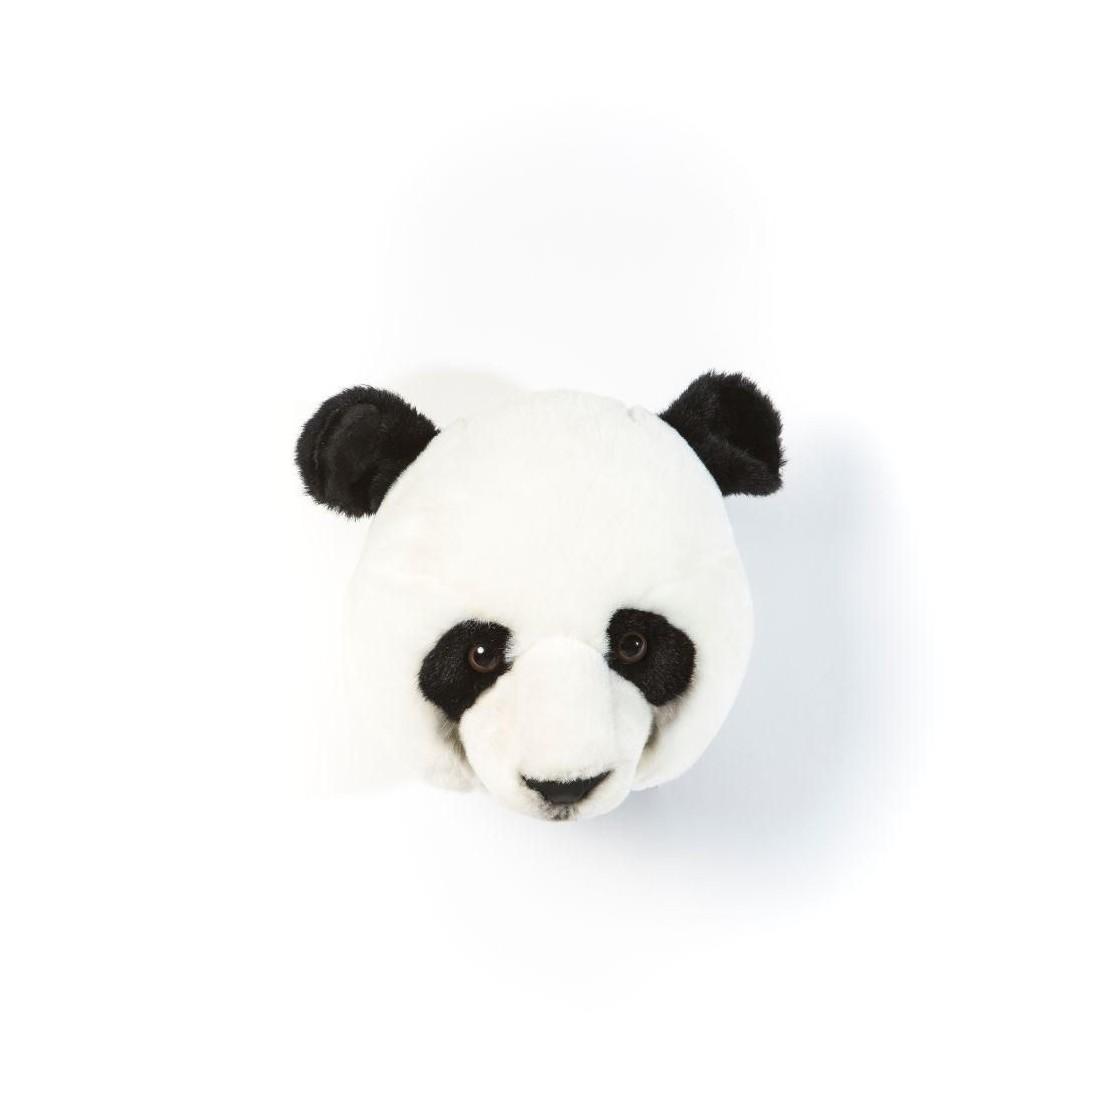 Thomas le panda - Wild & Soft